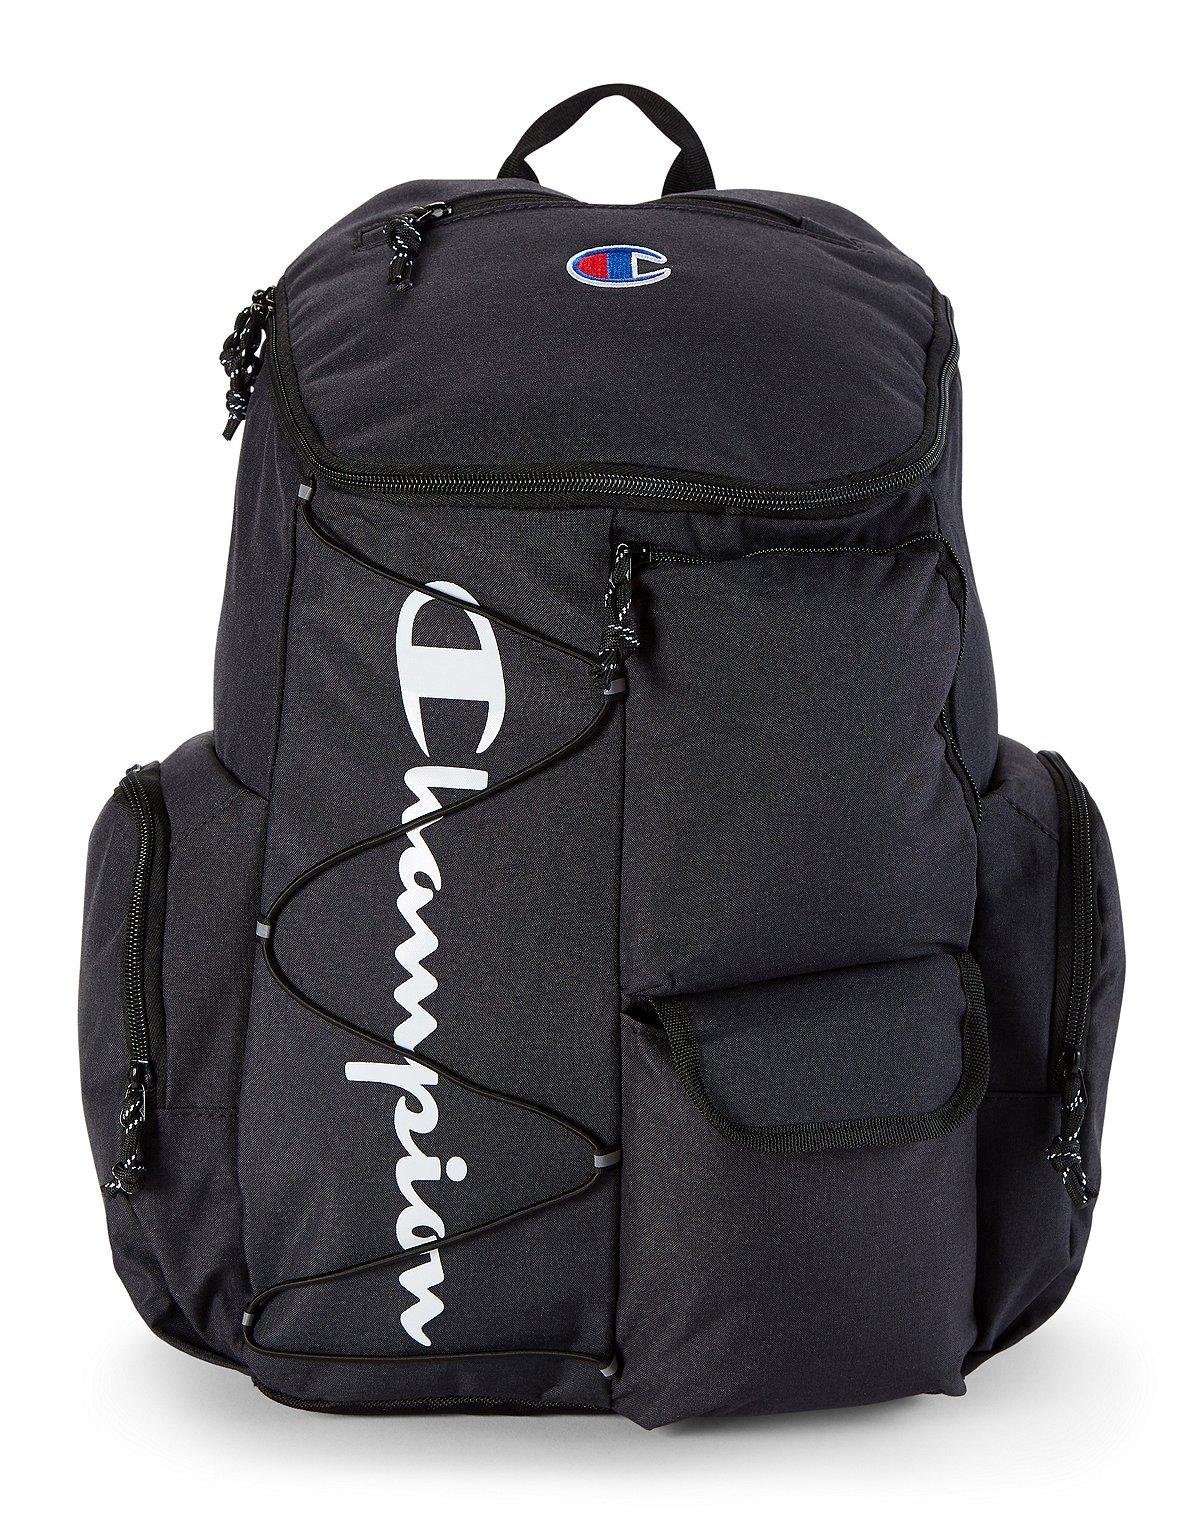 Black Utility Backpack - Champion